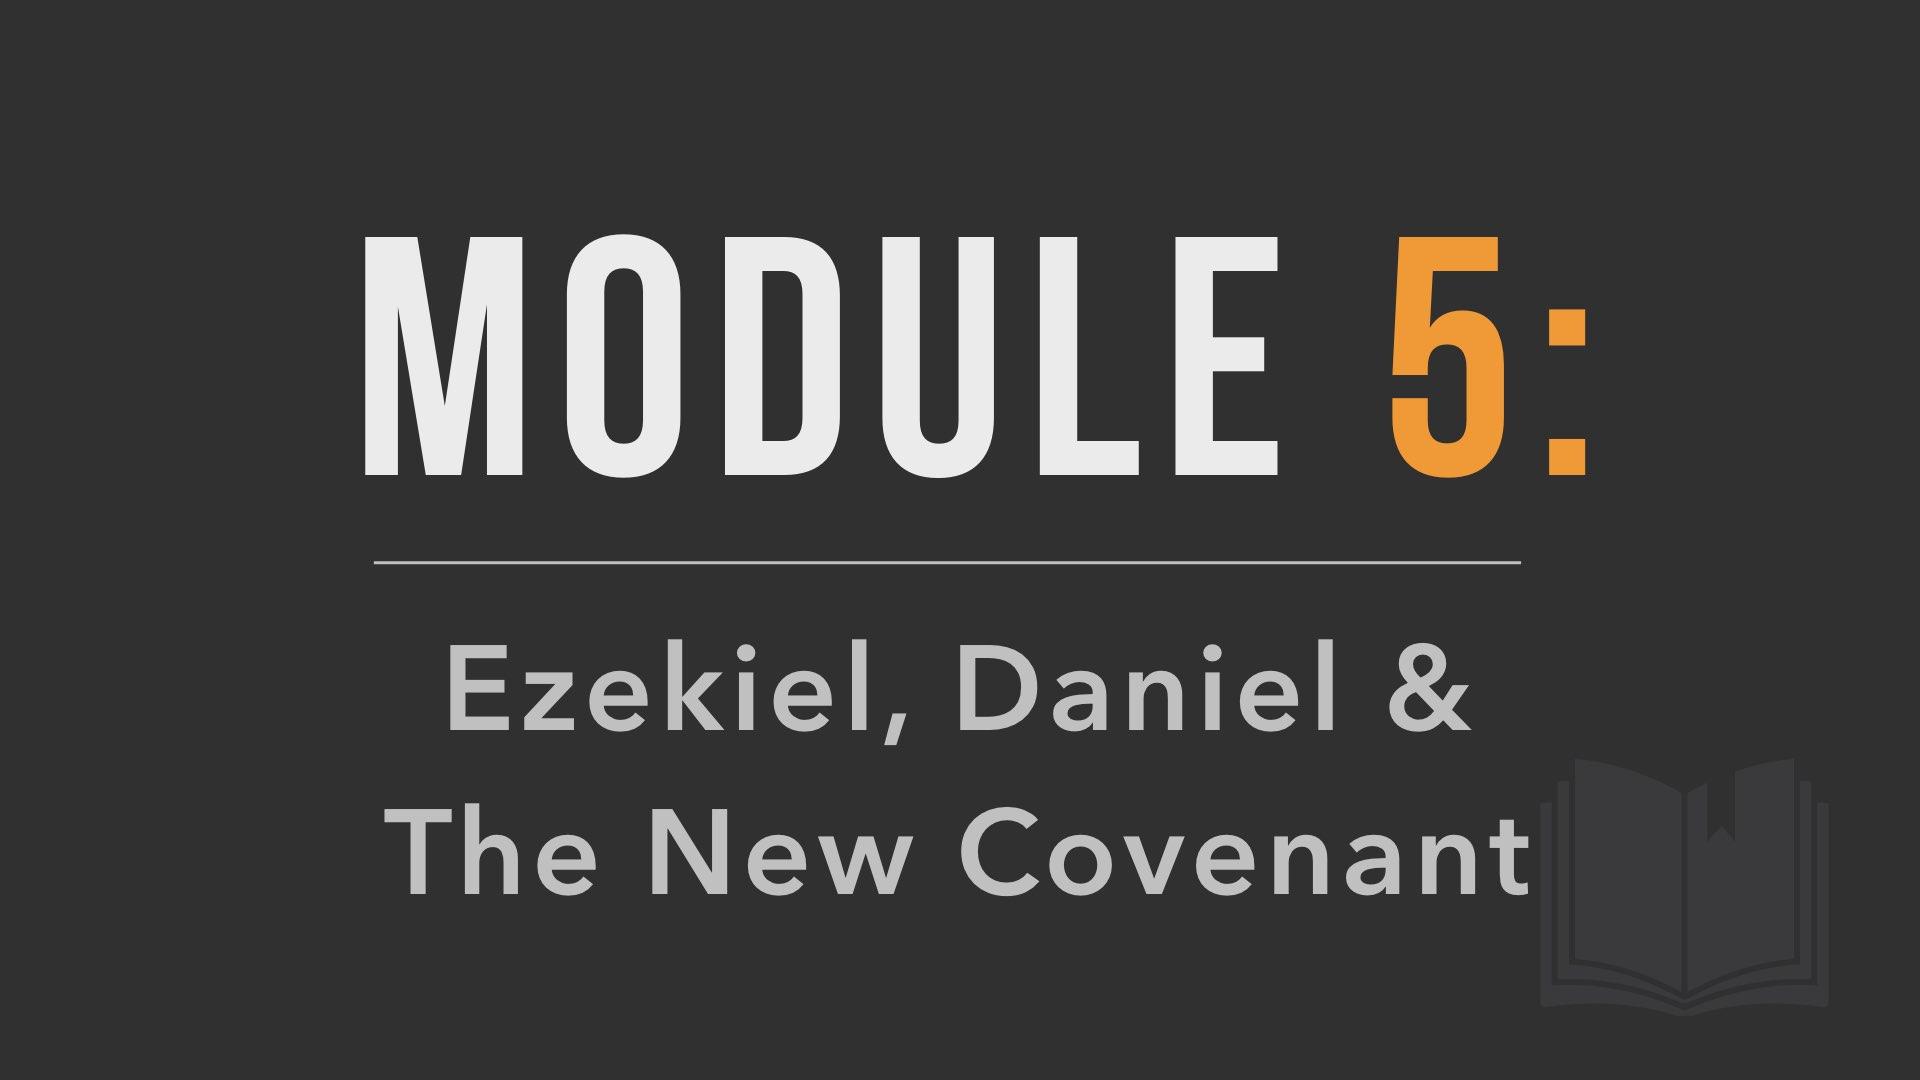 Module 5 Poster Image